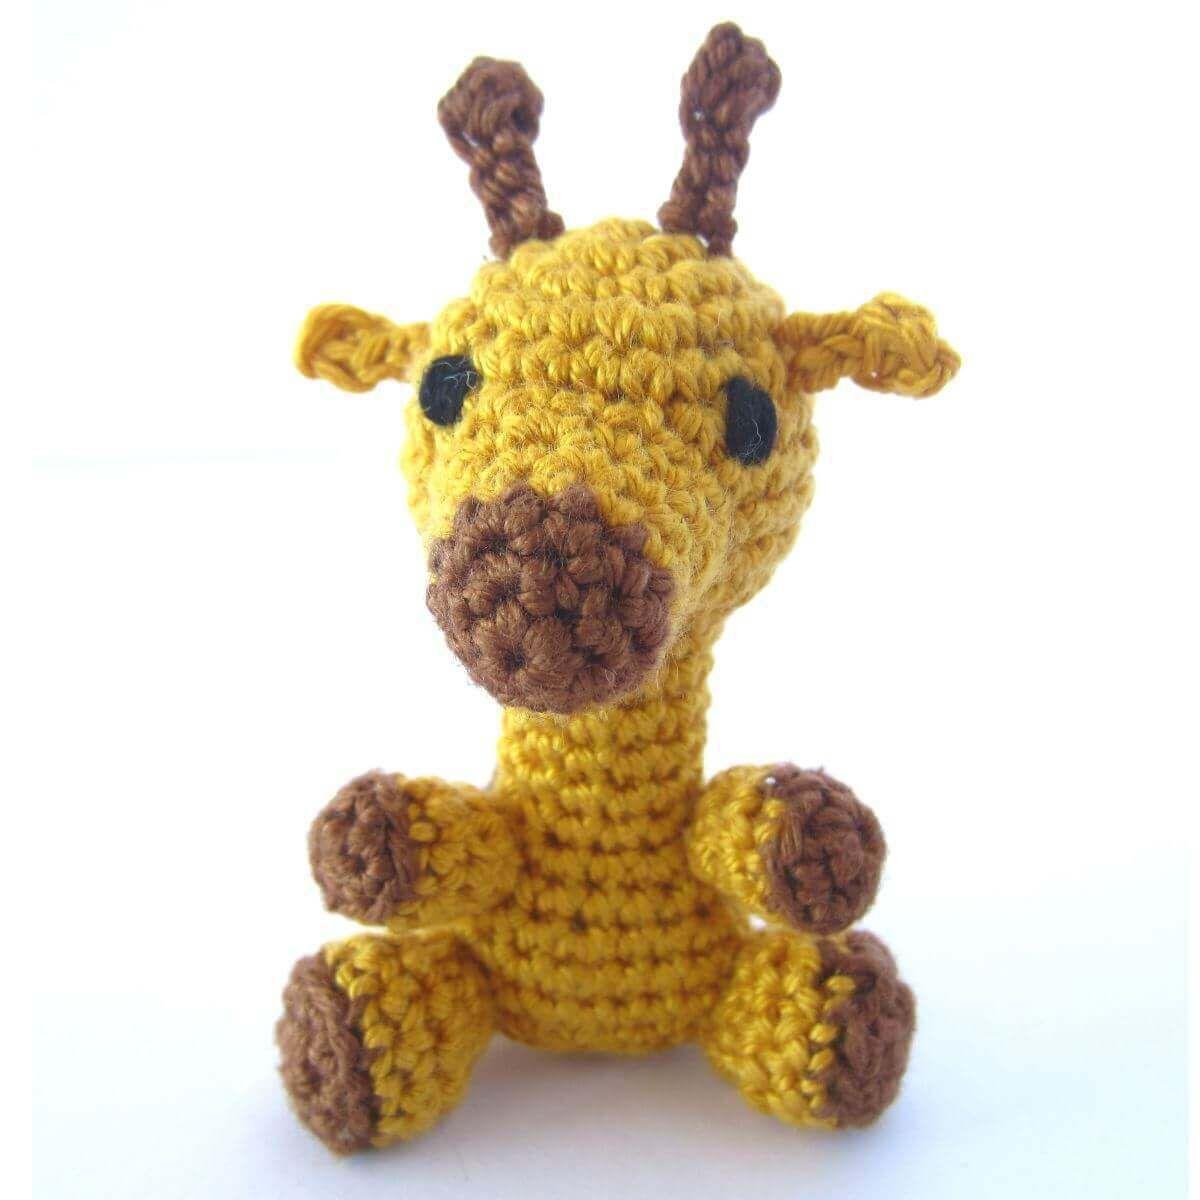 Amigurumi Giraffe häkeln Beitragsbild   Crafts   Pinterest ...